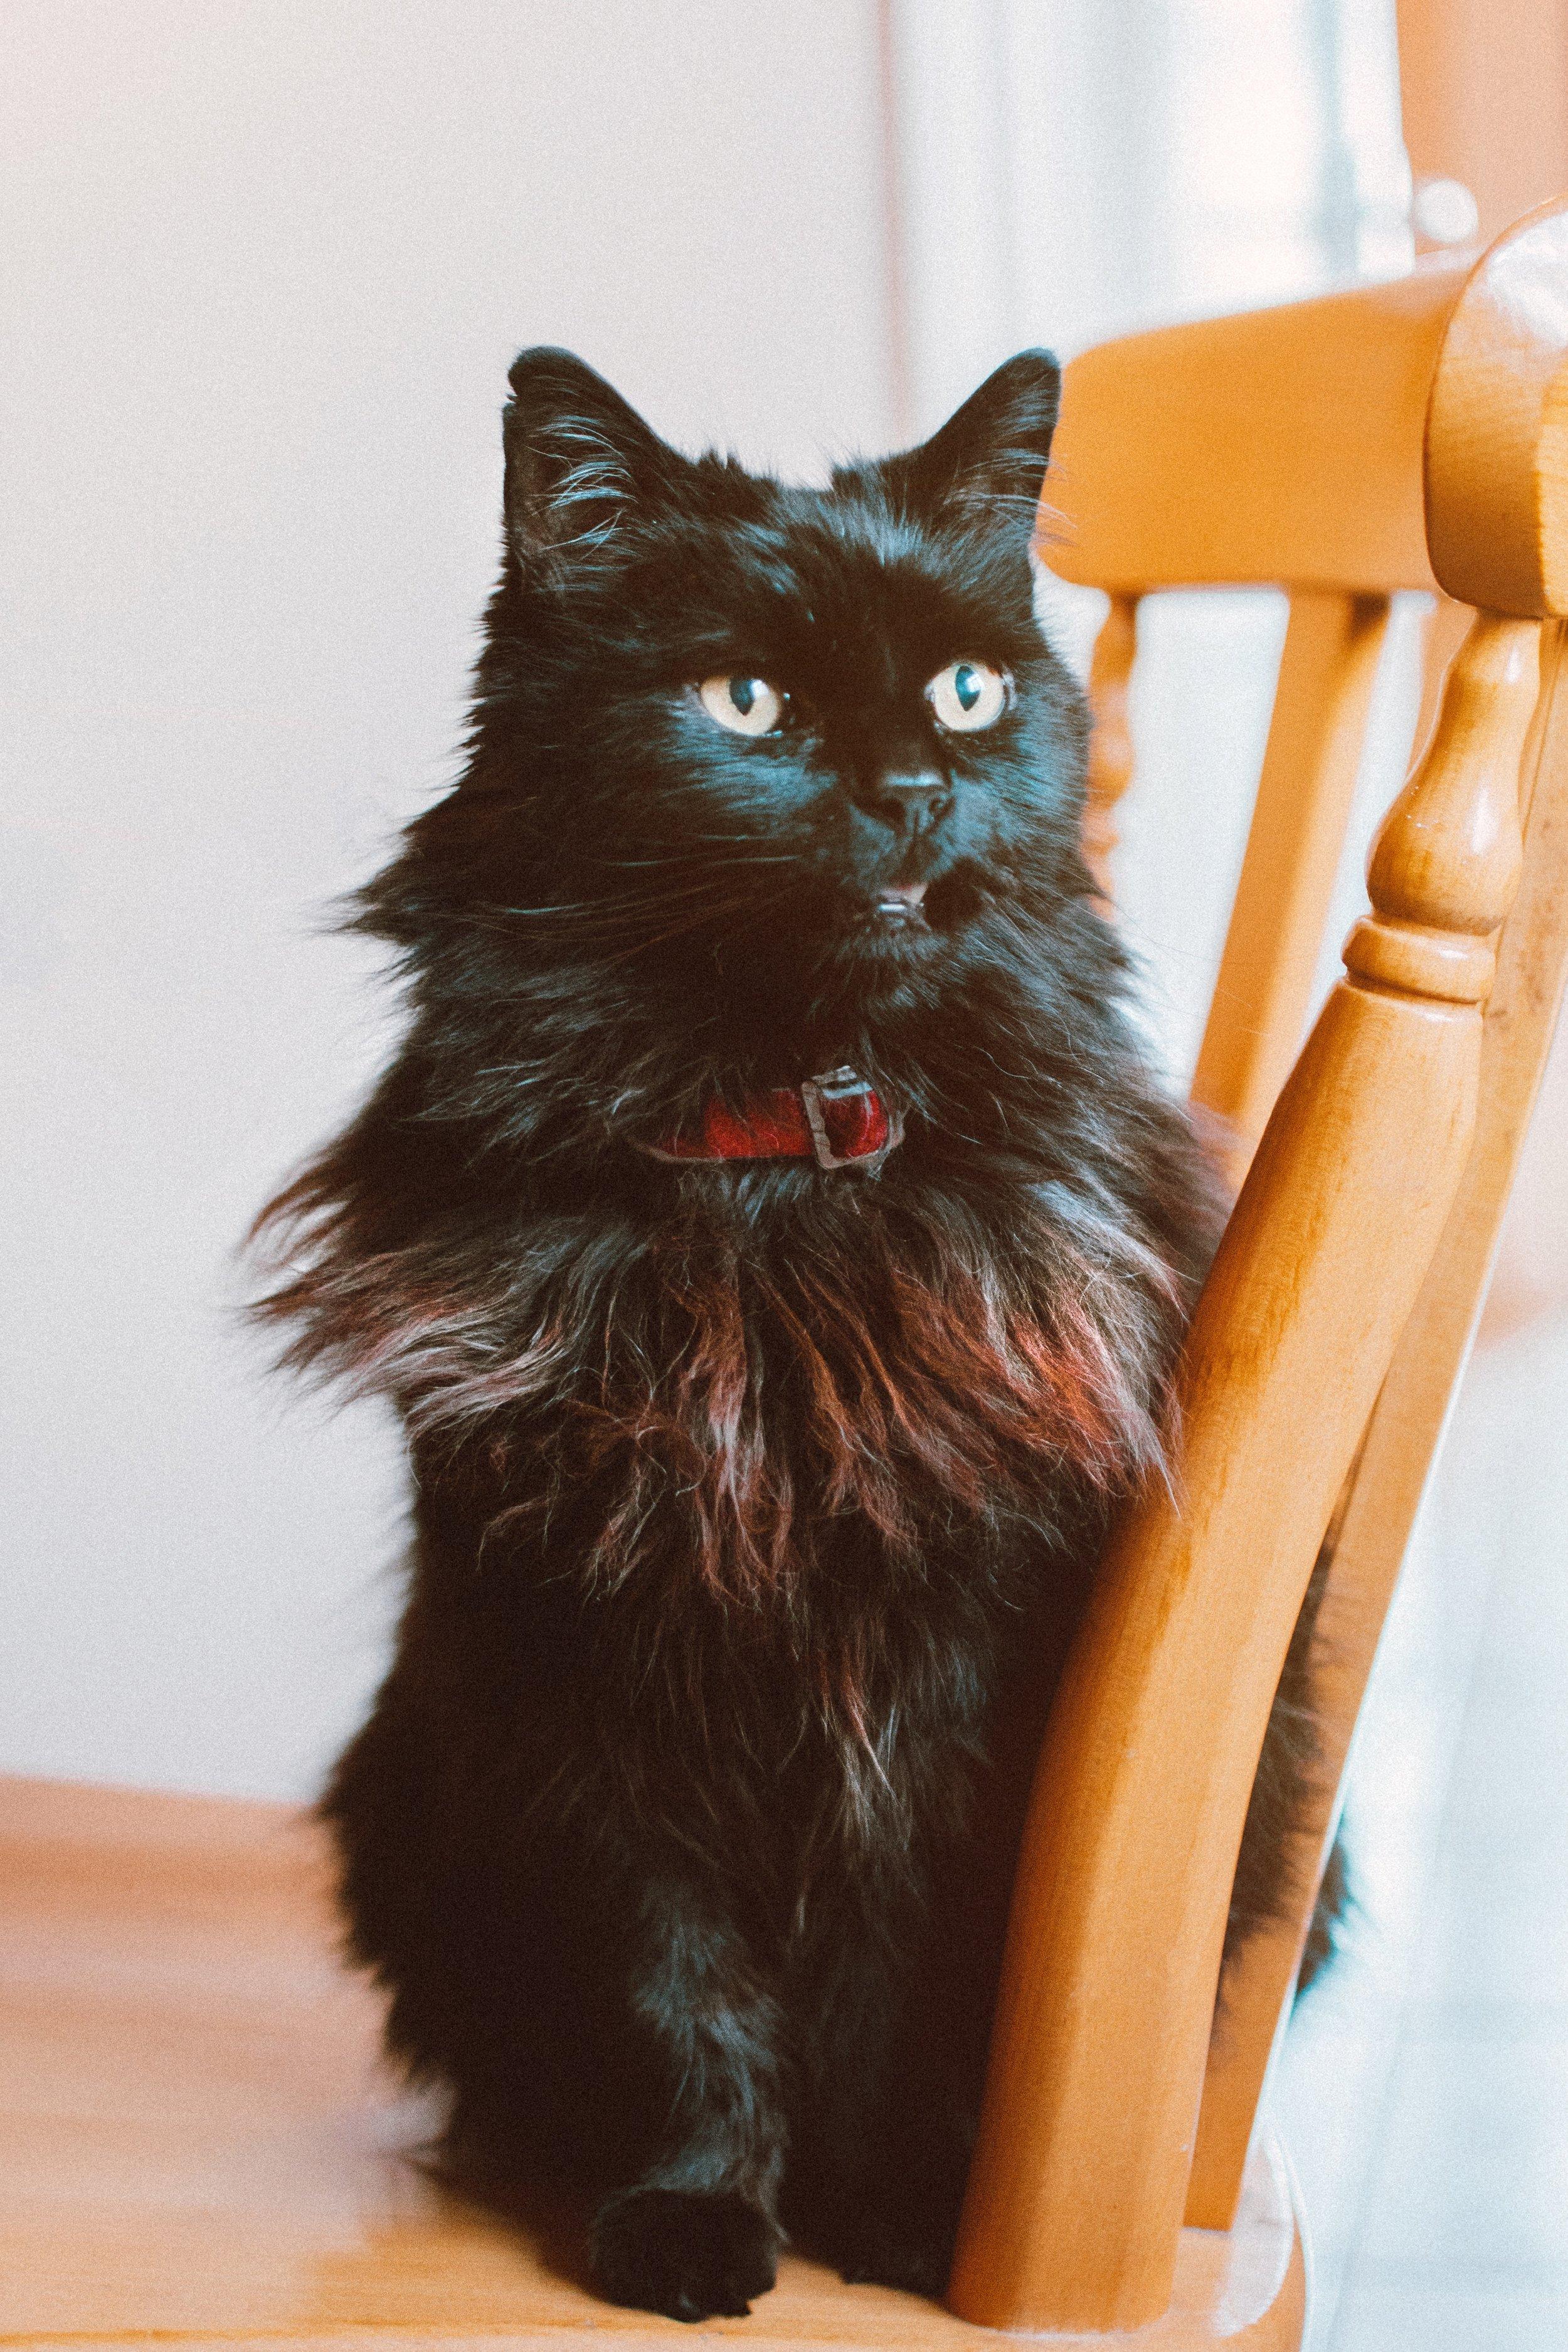 adorable-cat-close-up-1870320.jpg